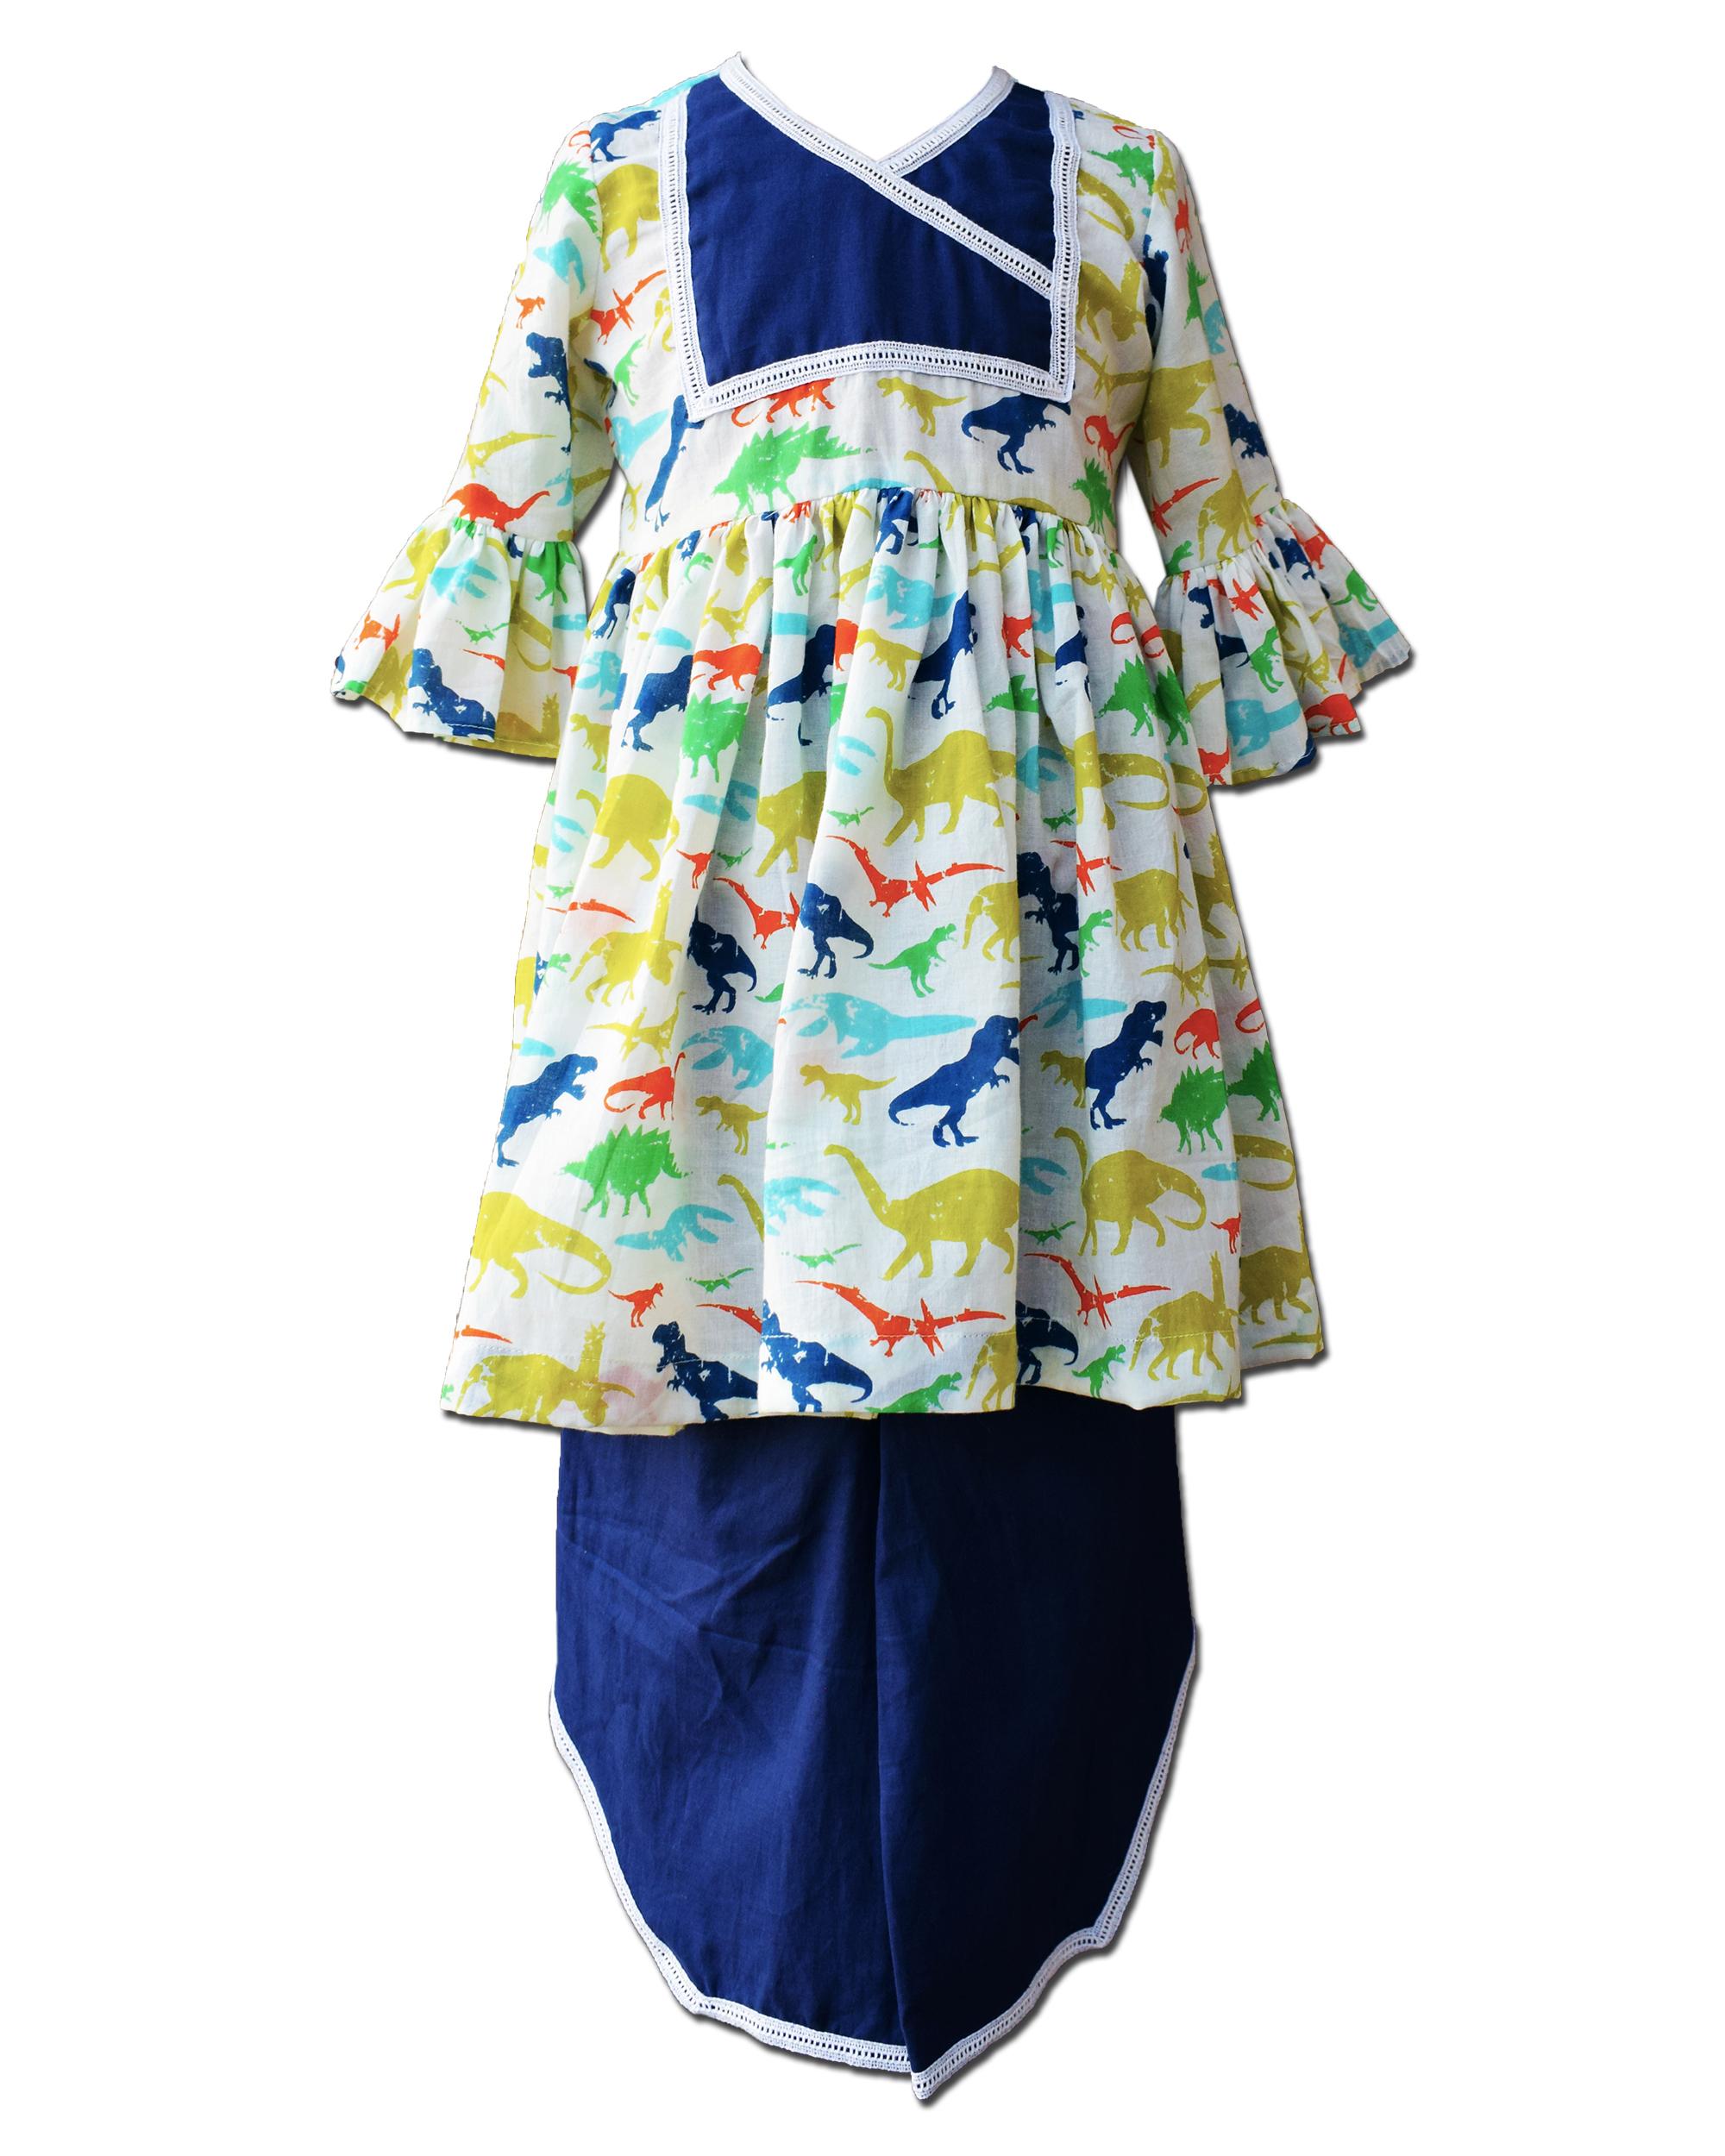 Dinosaur printed ruffled dress with blue dhoti pants - Set Of Two